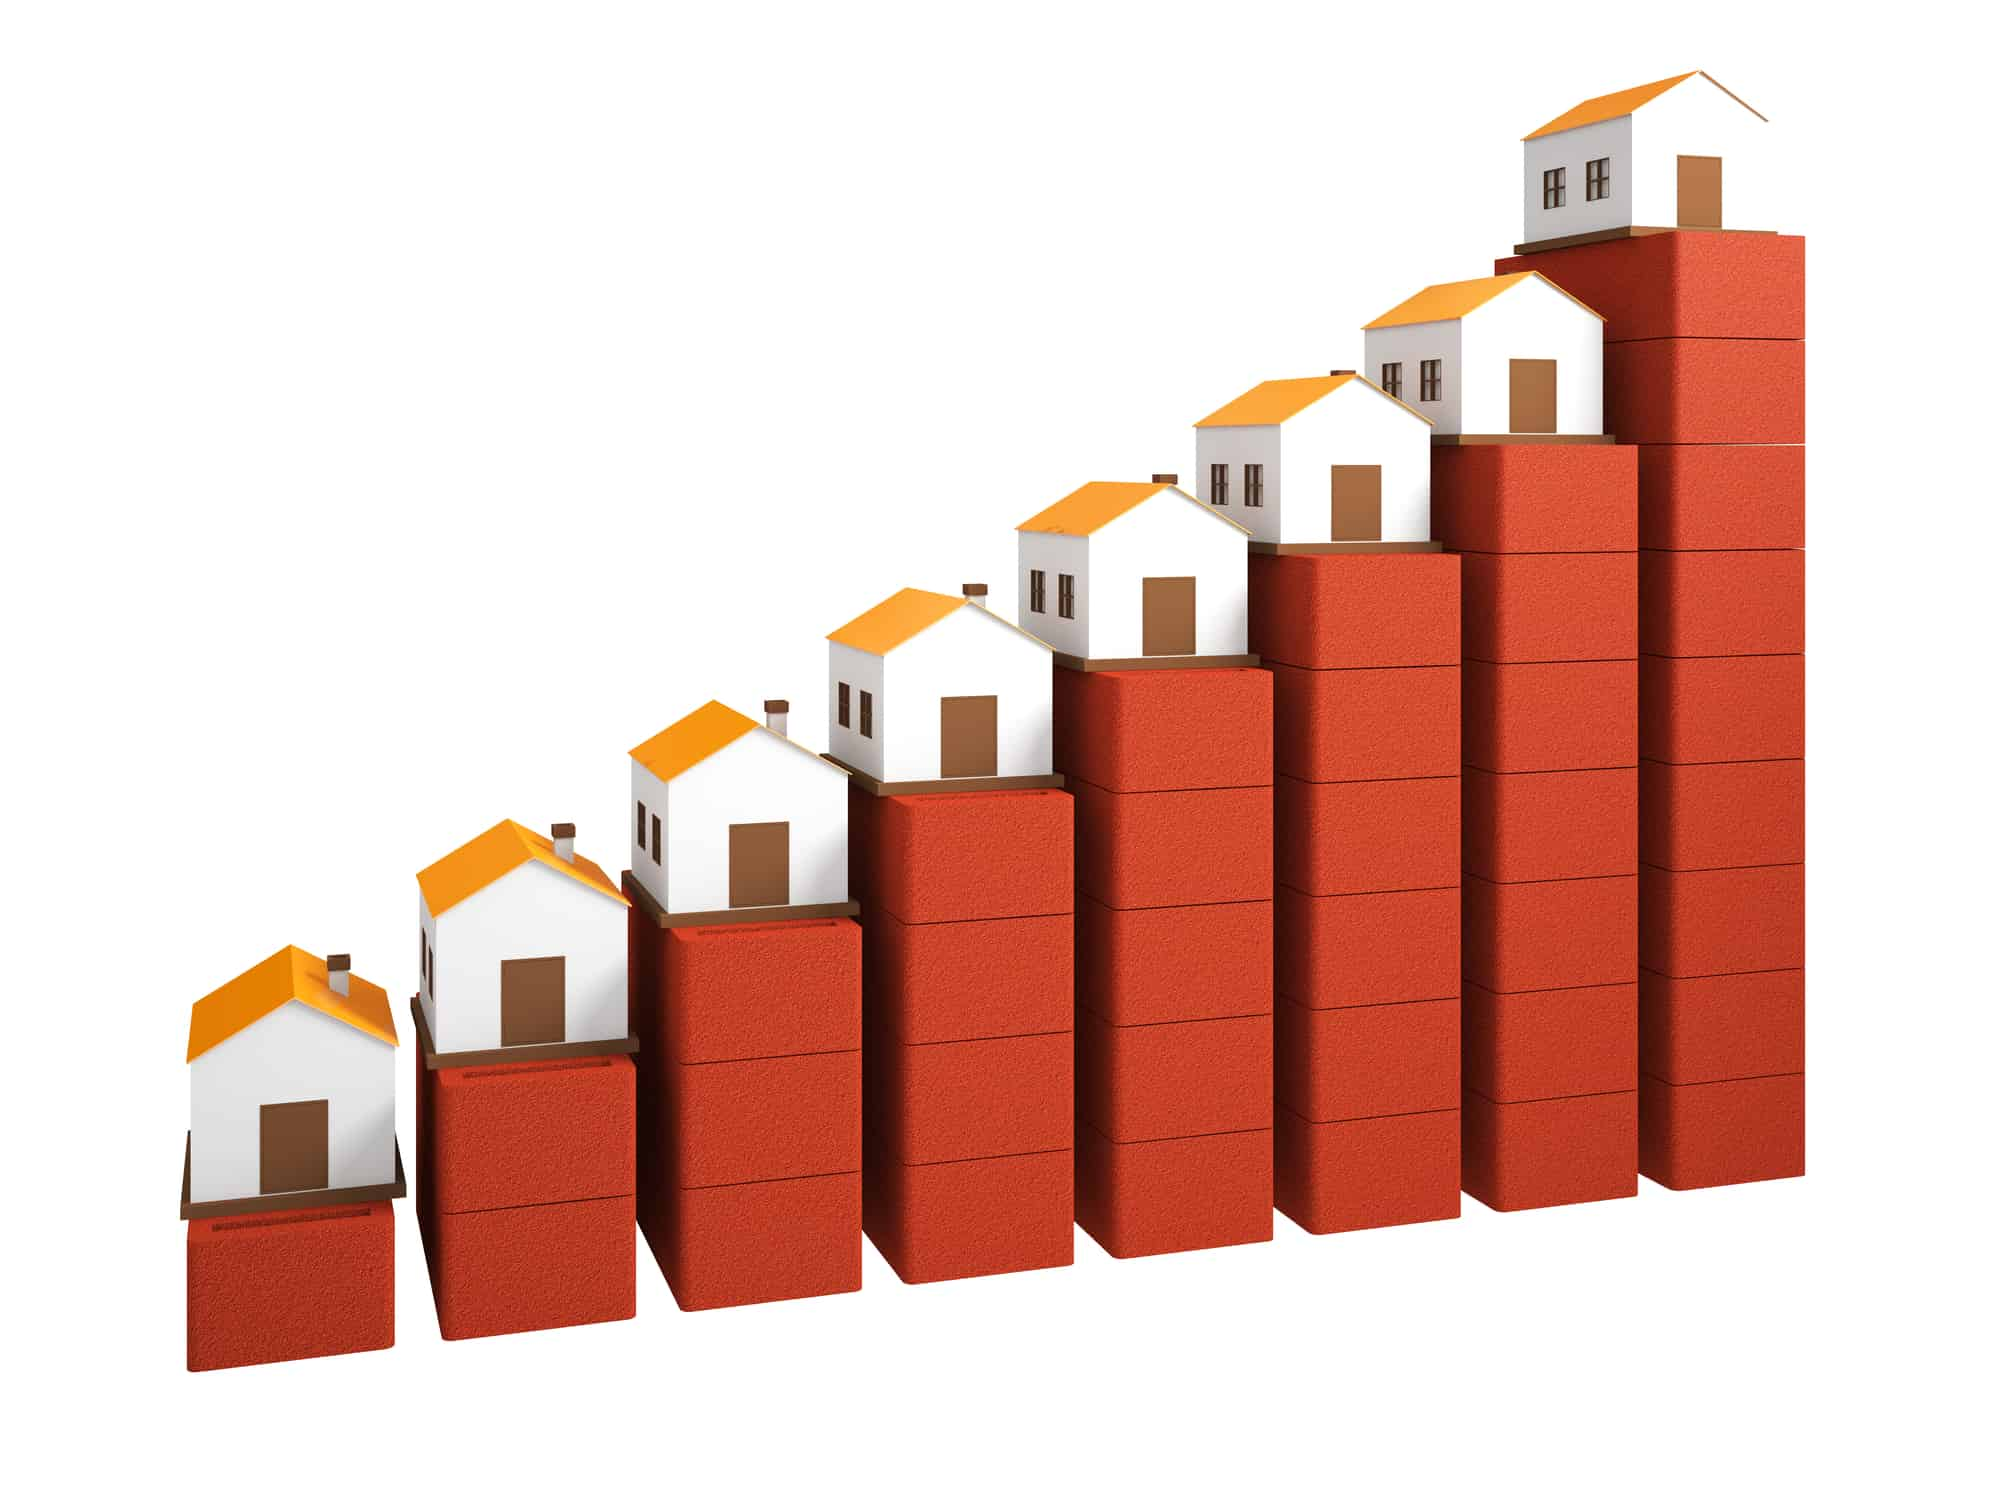 Illustrative real estate chart of housing